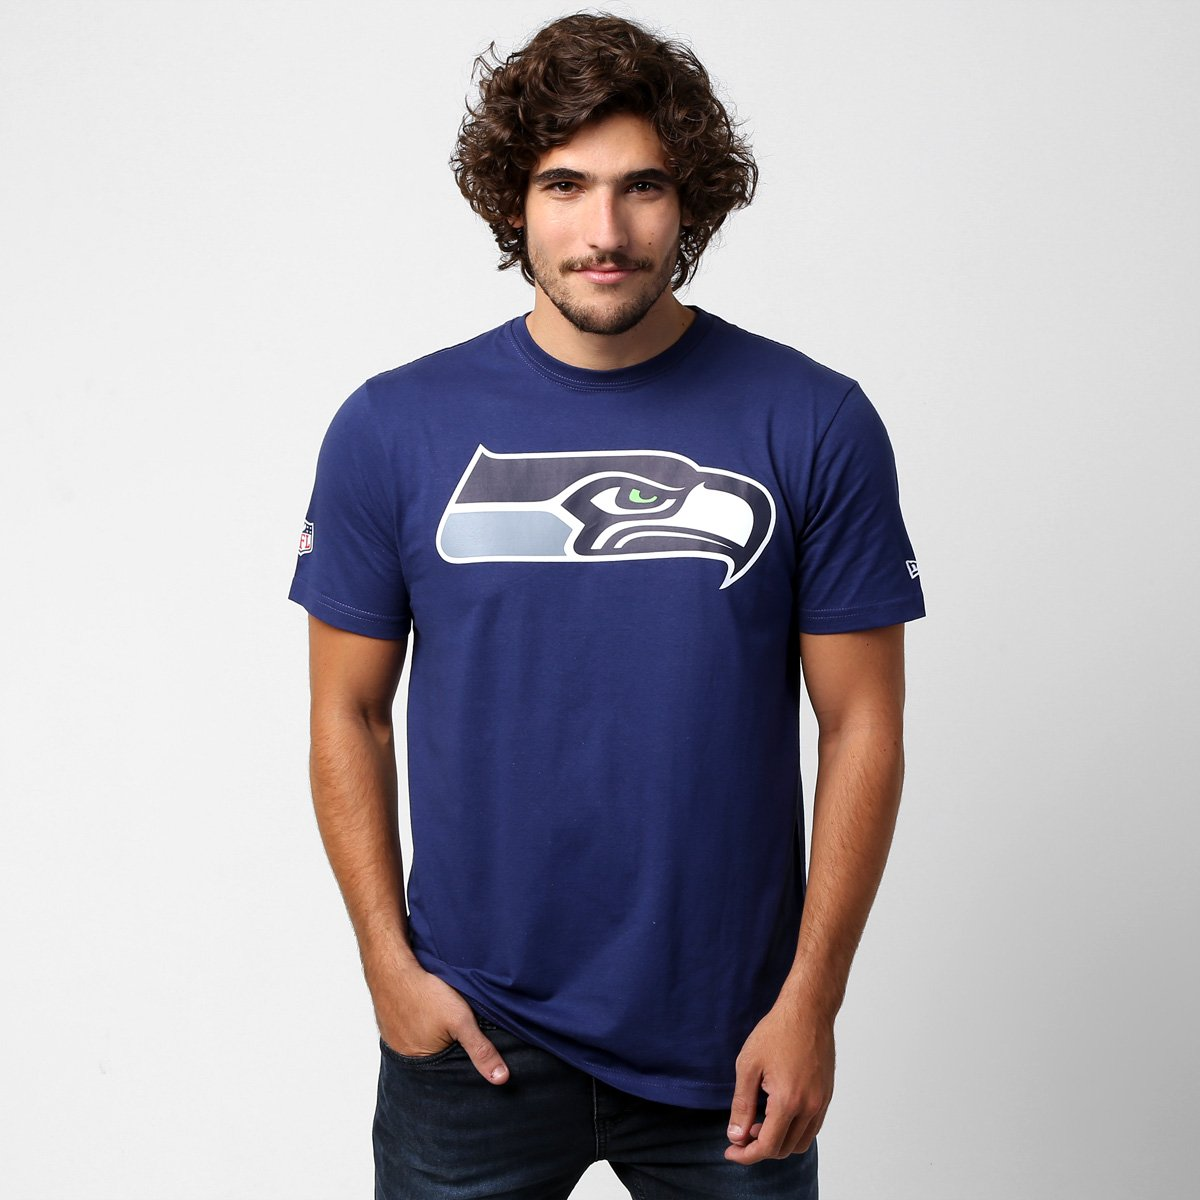 e7bca03aa Camiseta New Era NFL Seattle Seahawks - Azul Escuro - Compre Agora ...